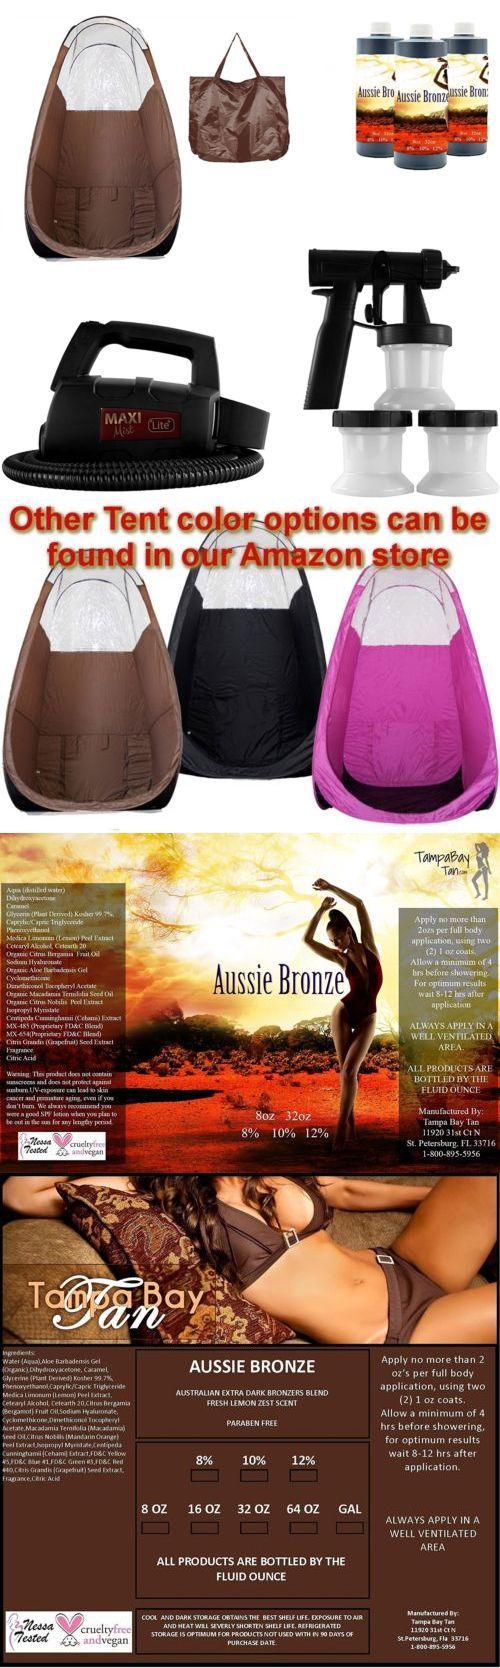 Airbrush Tanning Kits: Maxi-Mist Lite Plus Hvlp Sunless Spray Tanning Kit Tent Machine Airbrush Tan -> BUY IT NOW ONLY: $292.52 on eBay!